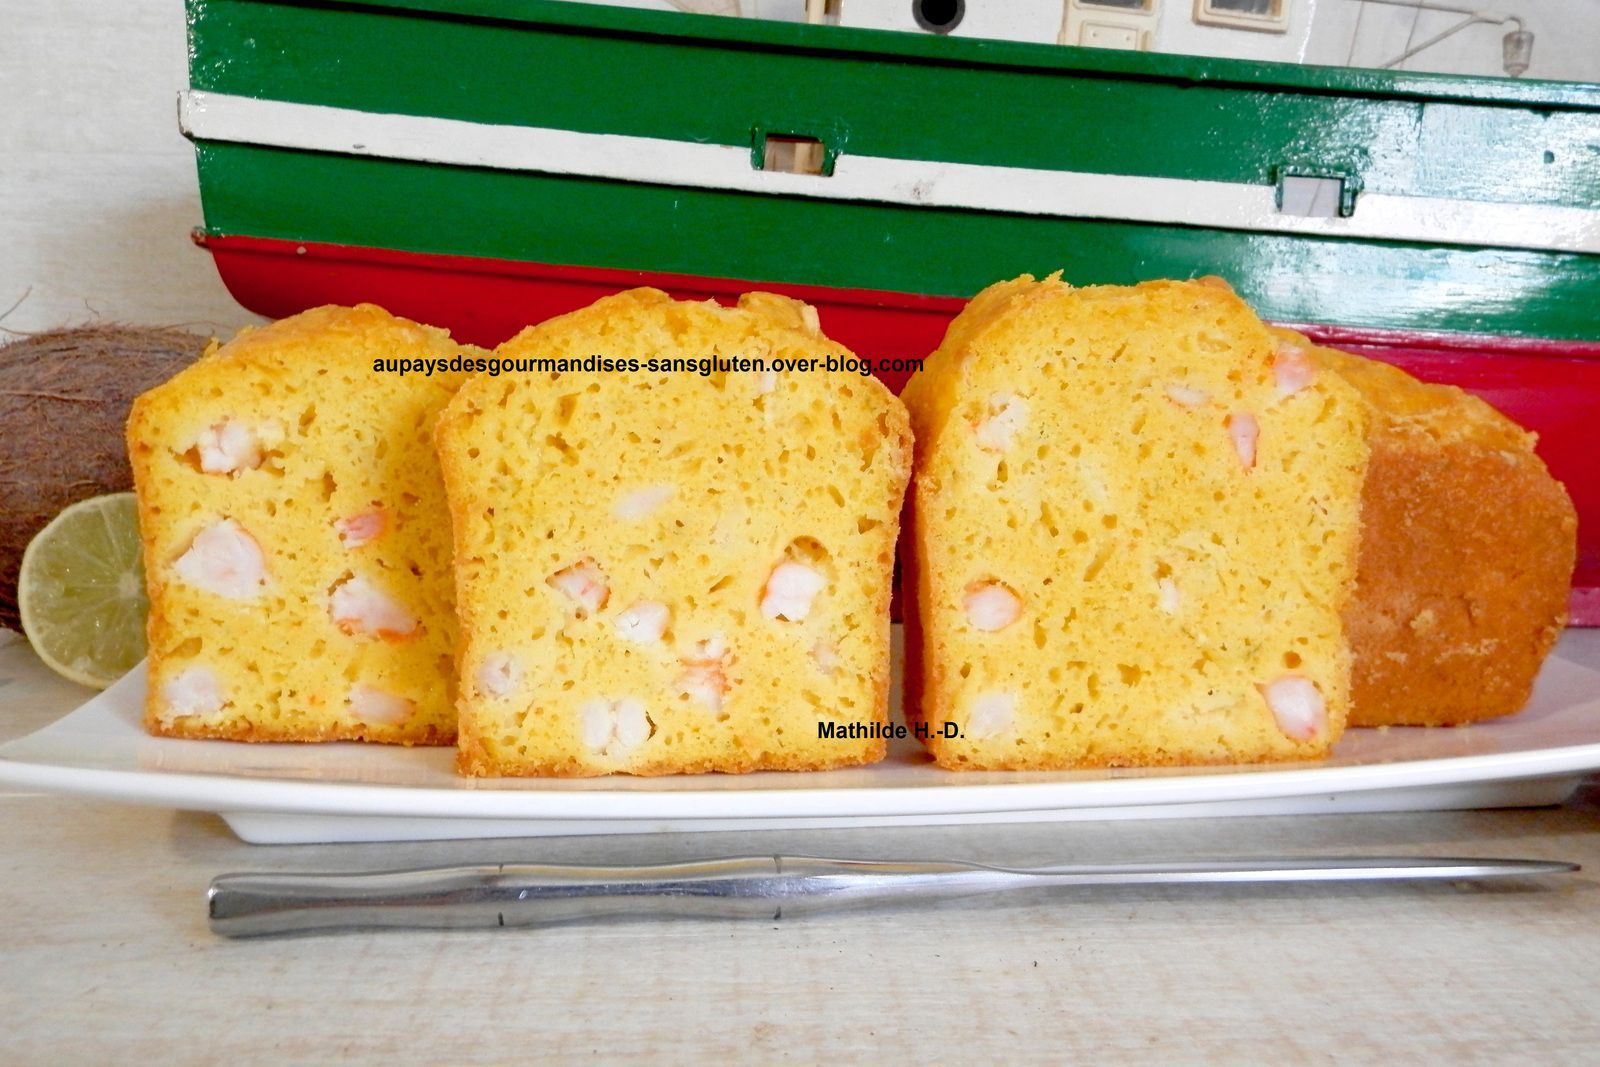 Cake Thaï d'après Ilona Chovancova : crevettes, coco, citron vert, curcuma